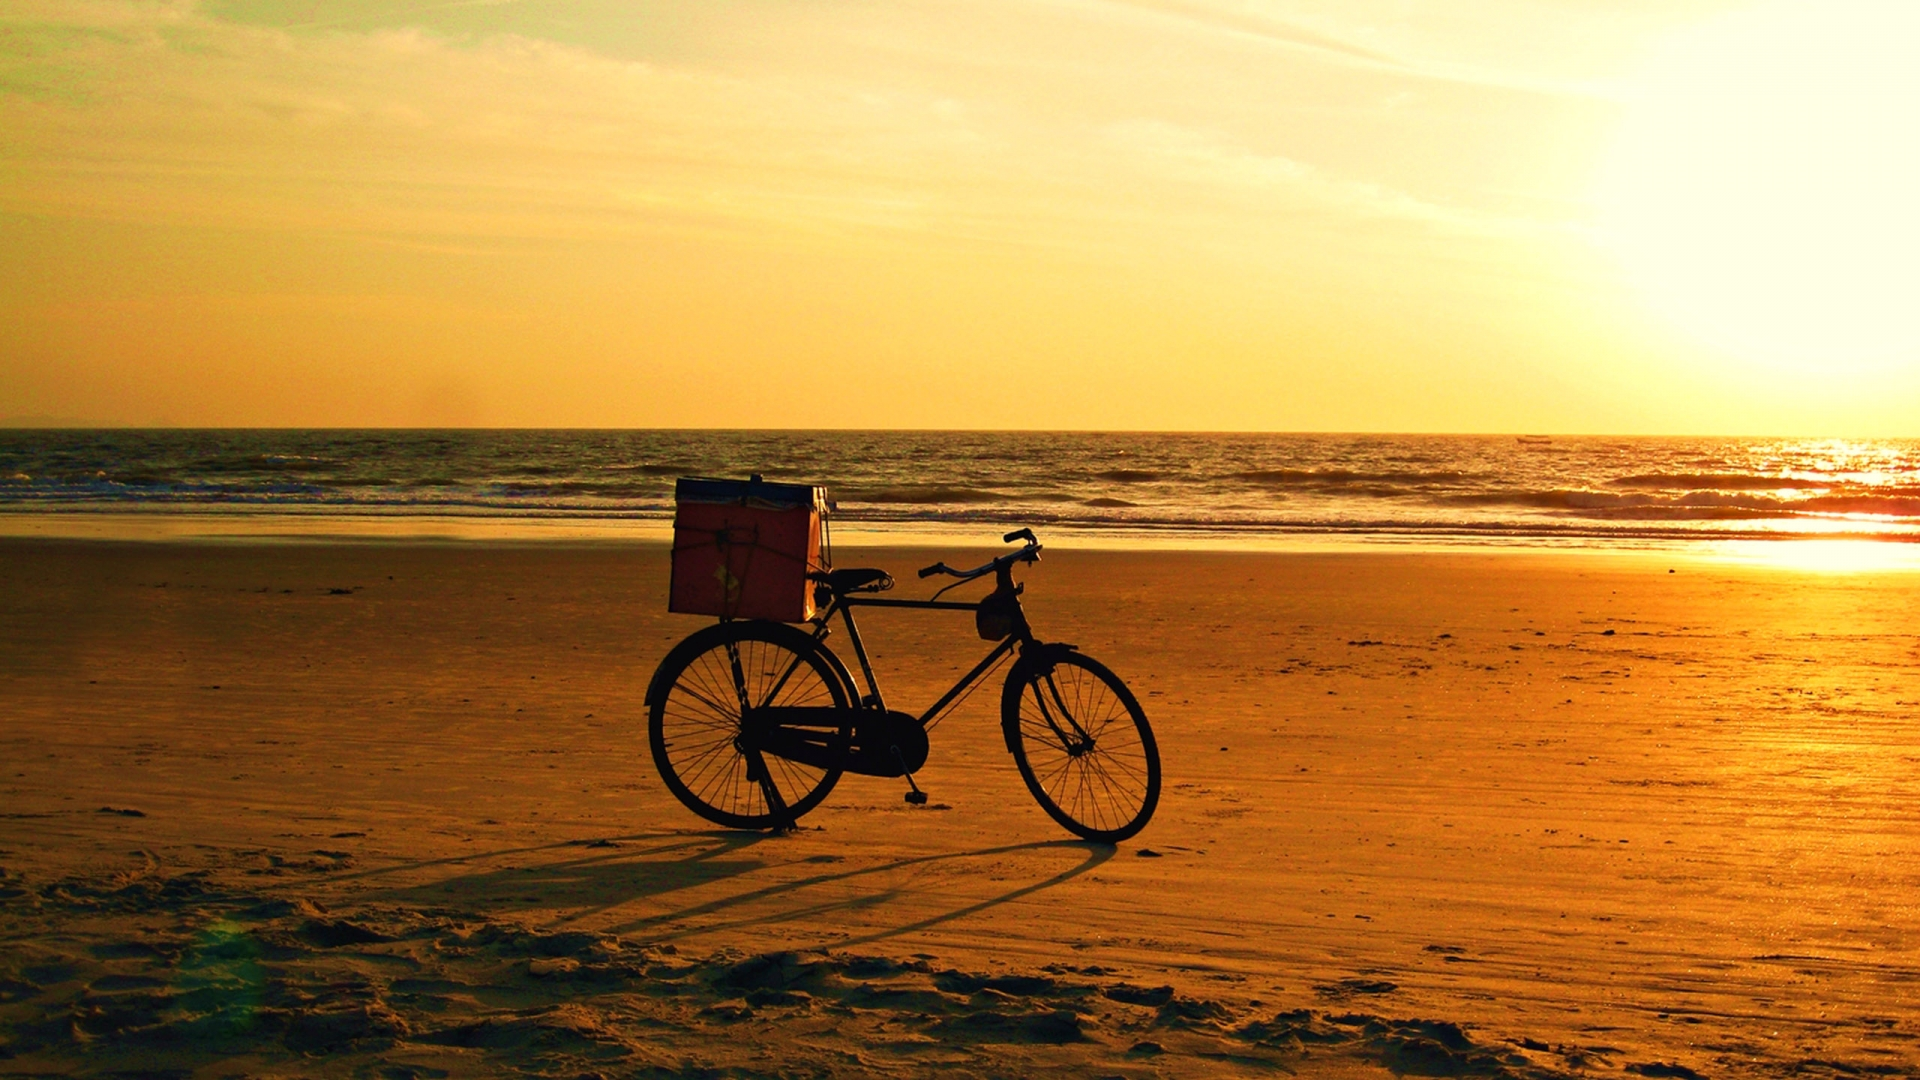 retro wallpaper beach cycle